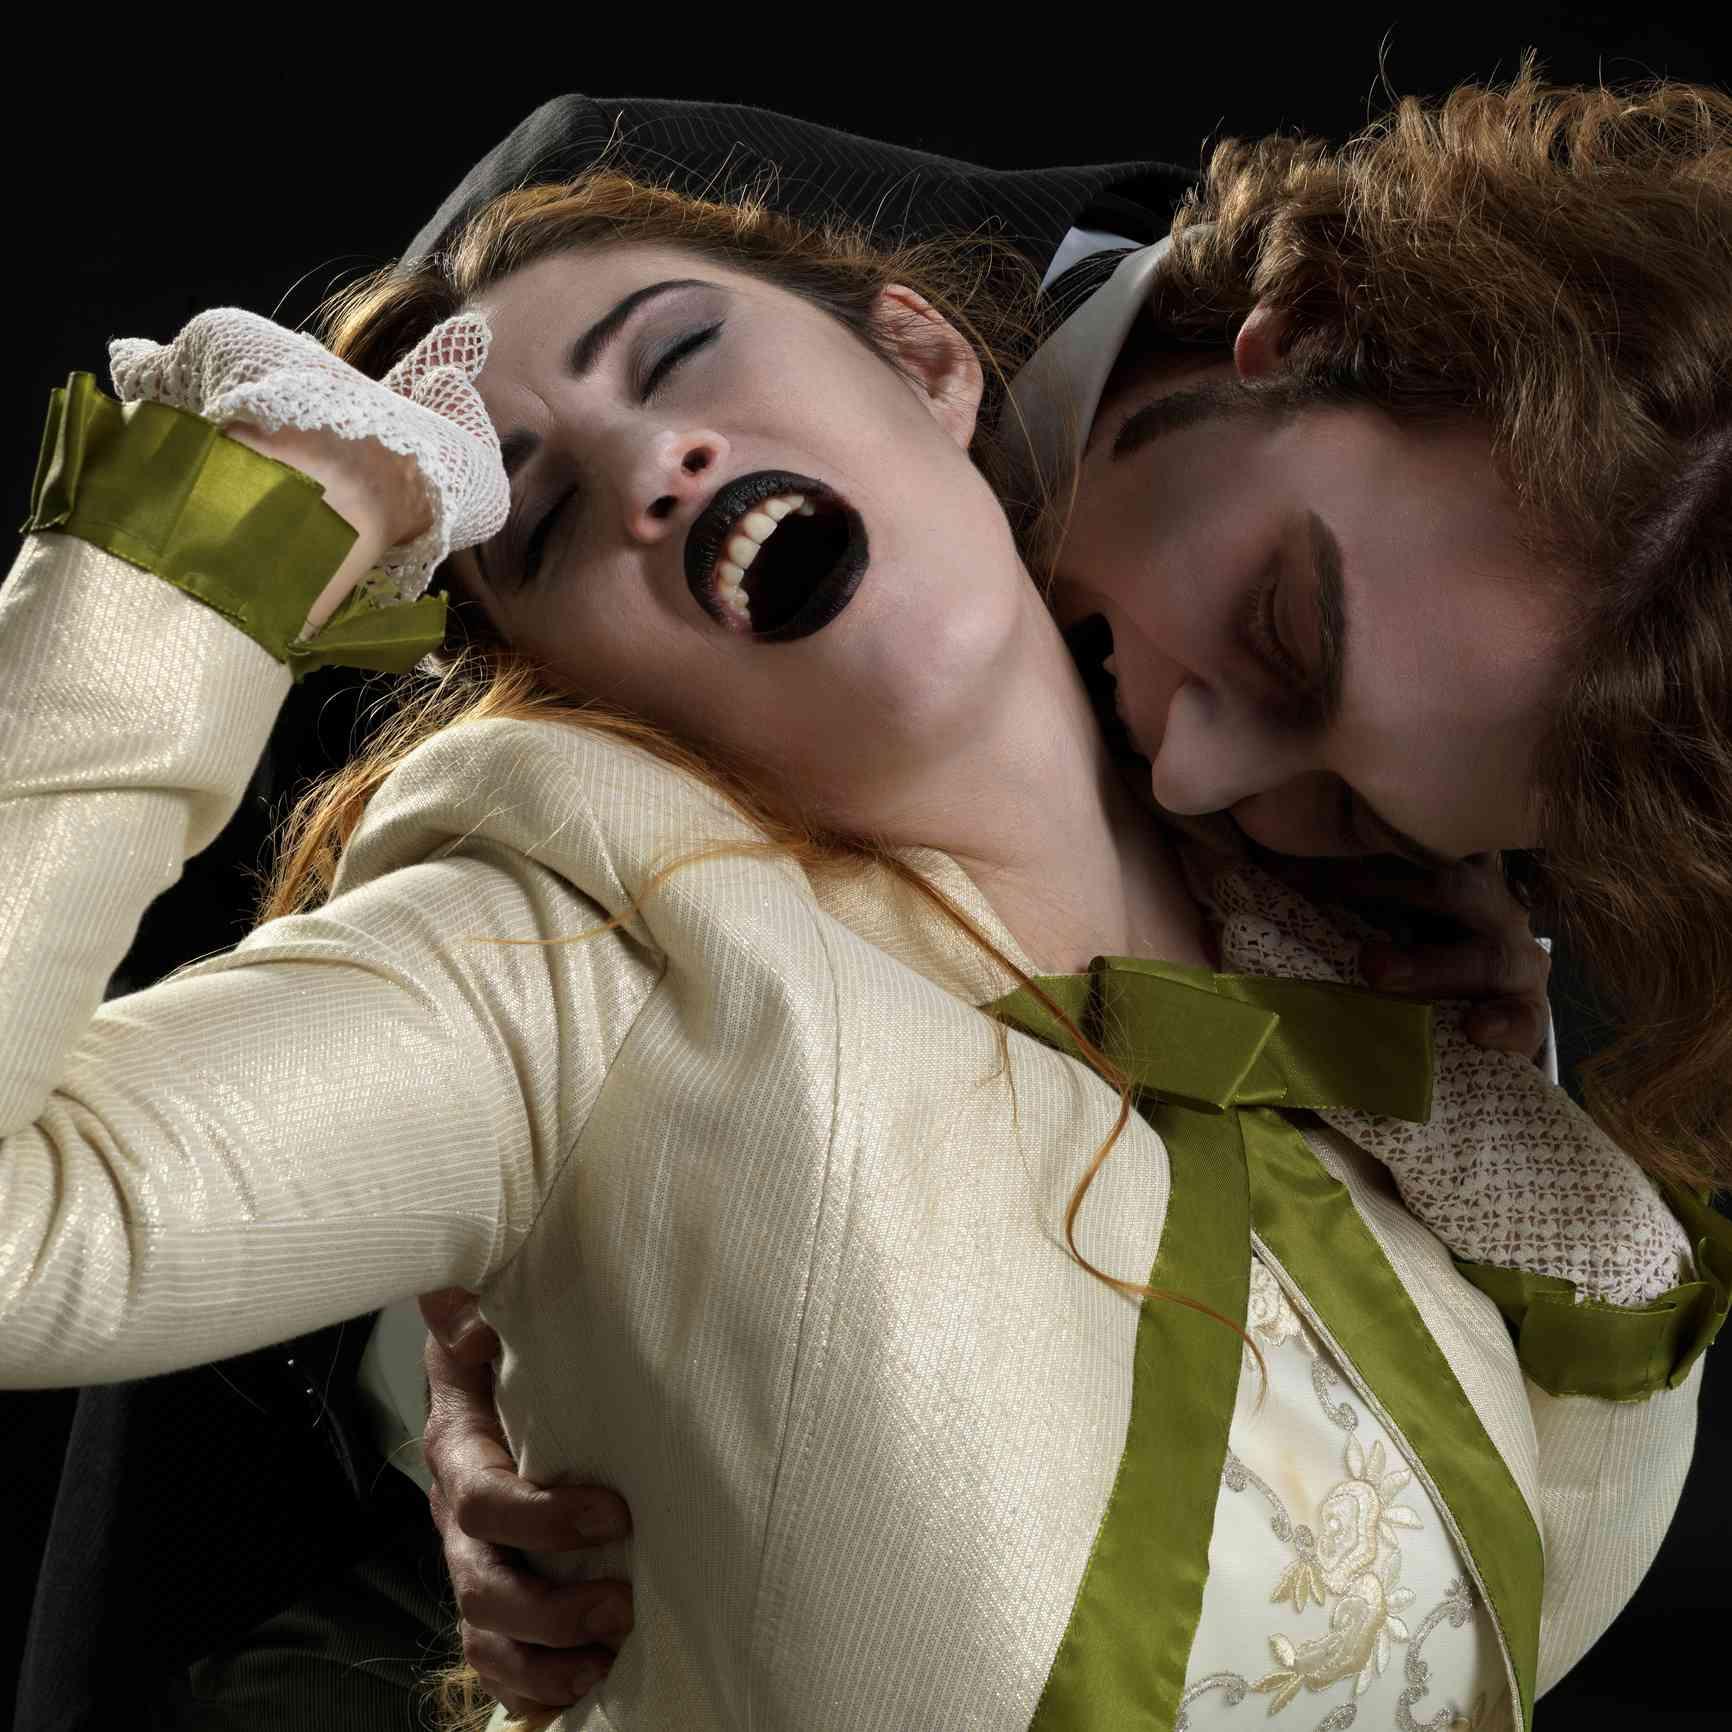 Vampire biting Victorian woman